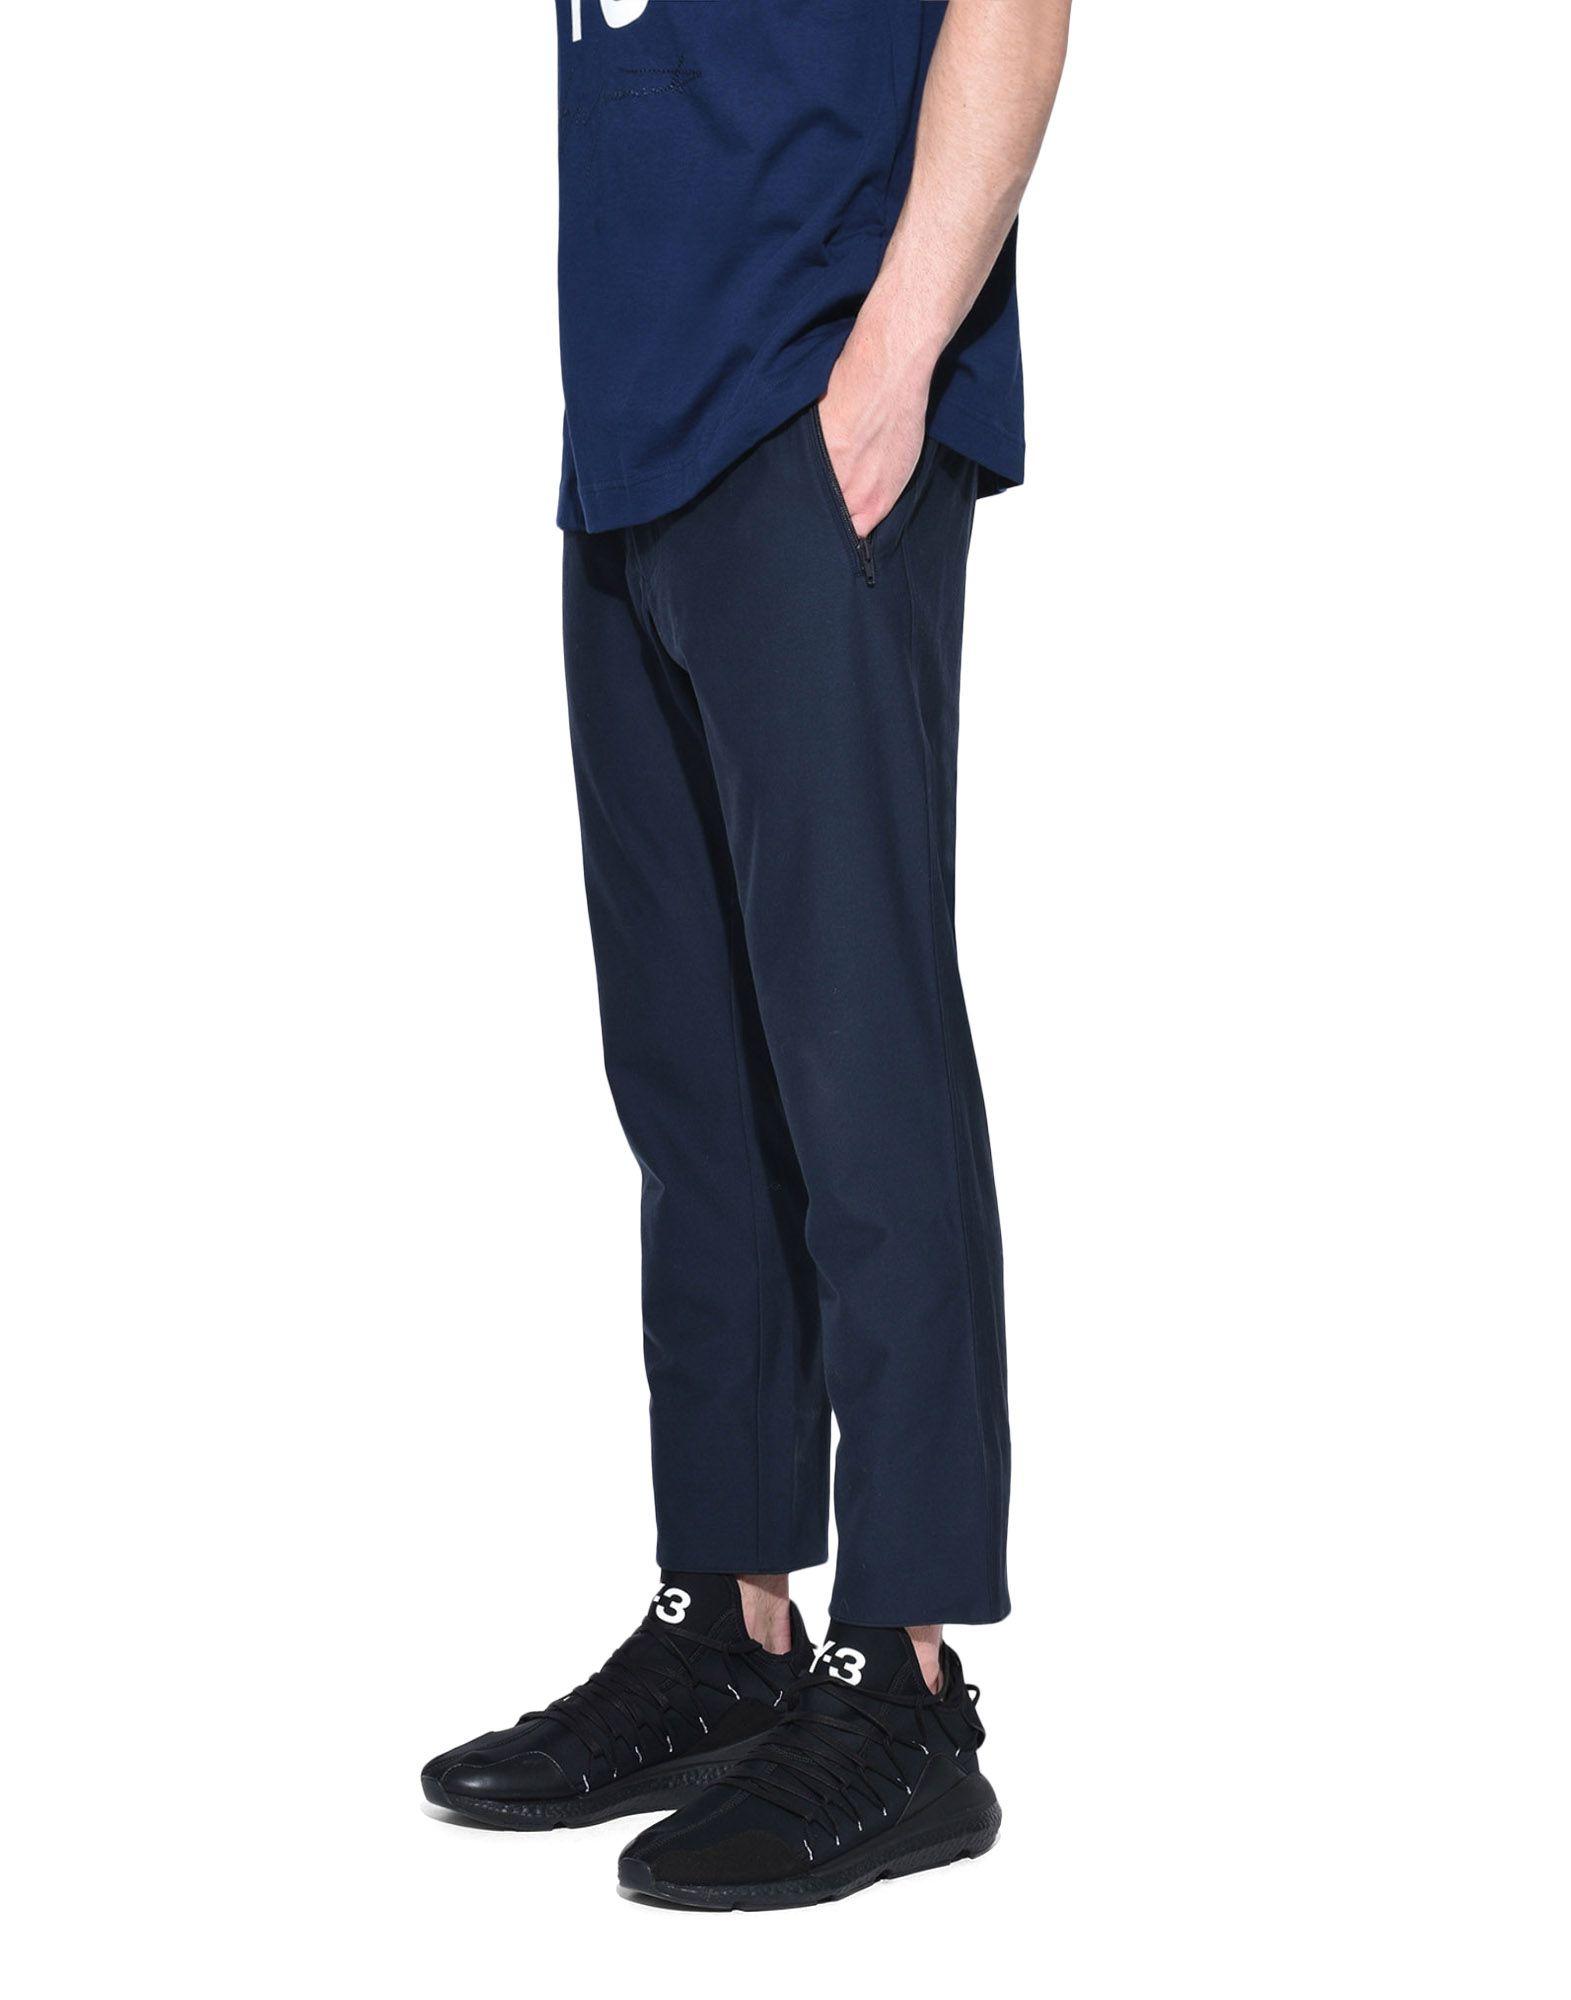 Y-3 Y-3 Twill Cropped Pants dreiviertellange Hose Herren e